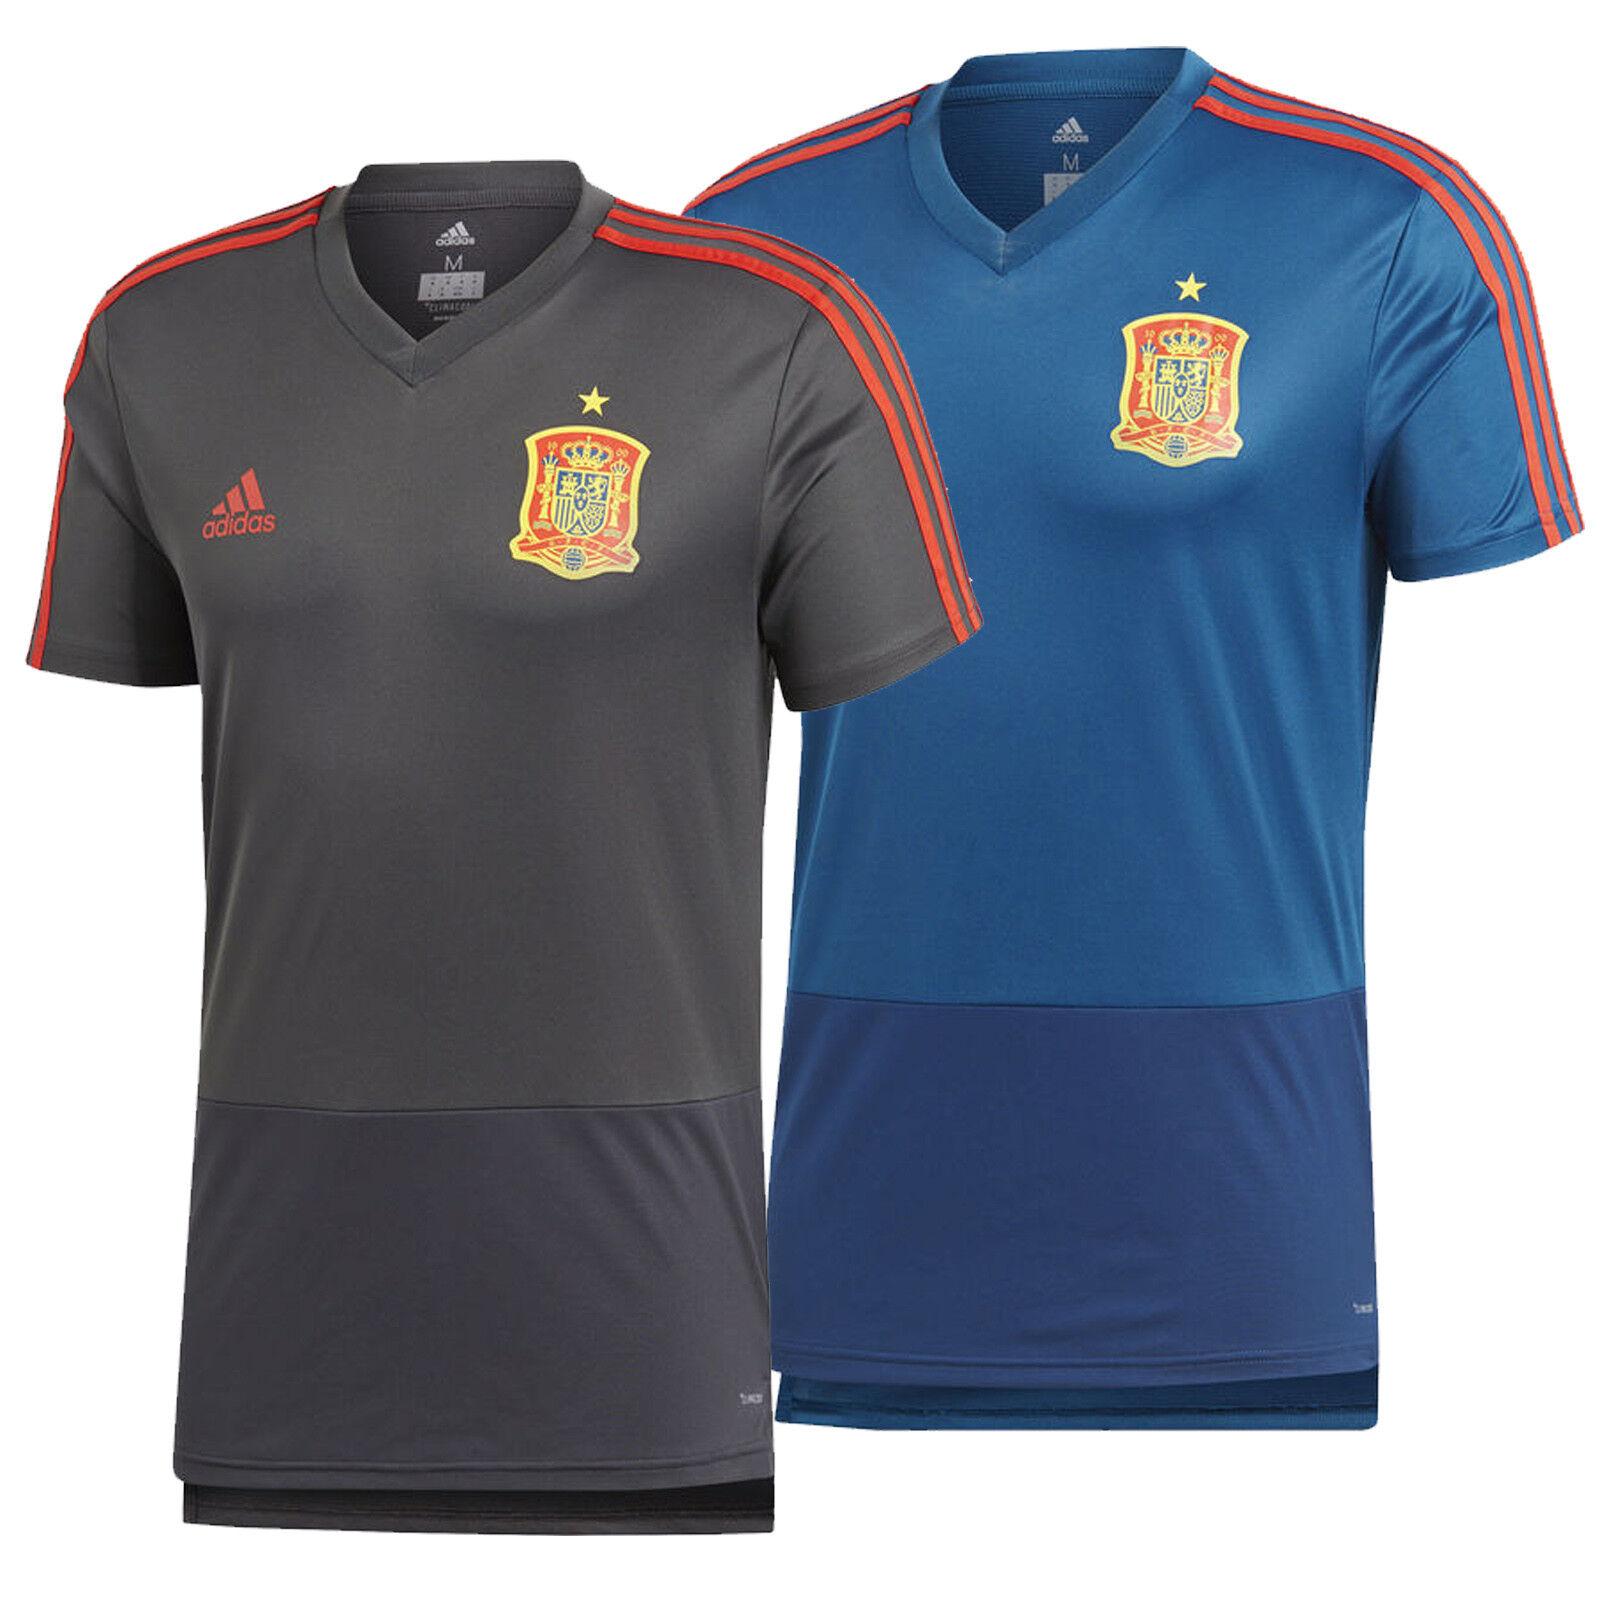 2a2bcdc54da Adidas Spain Training Jersey Climacool Football Top New